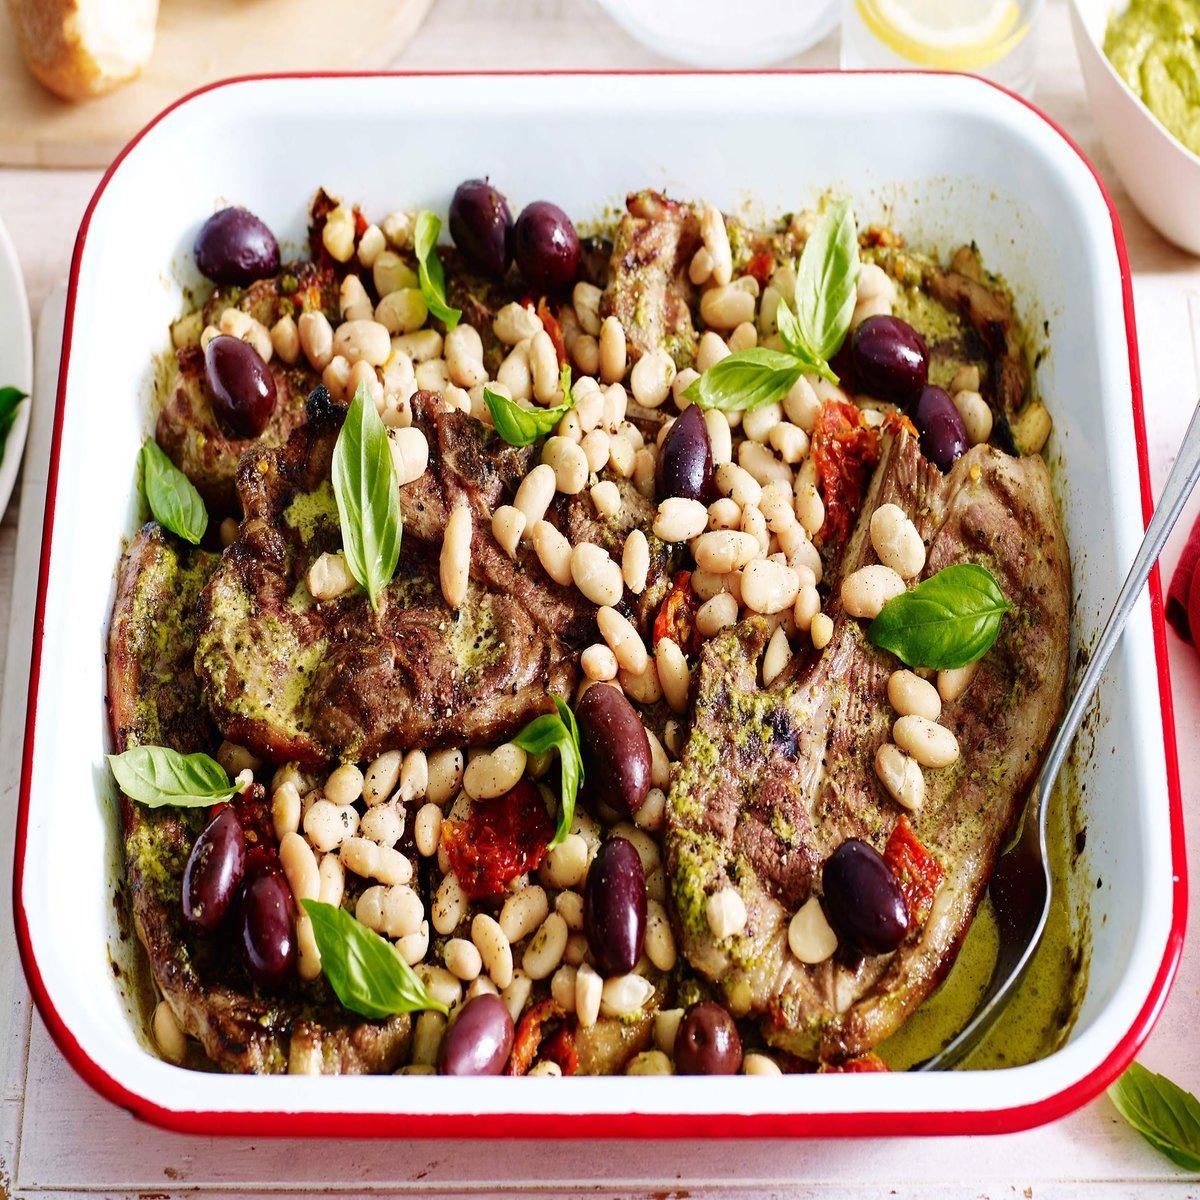 lamb-tray-bake-with-pesto-tomatoes-and-olives-103496-1